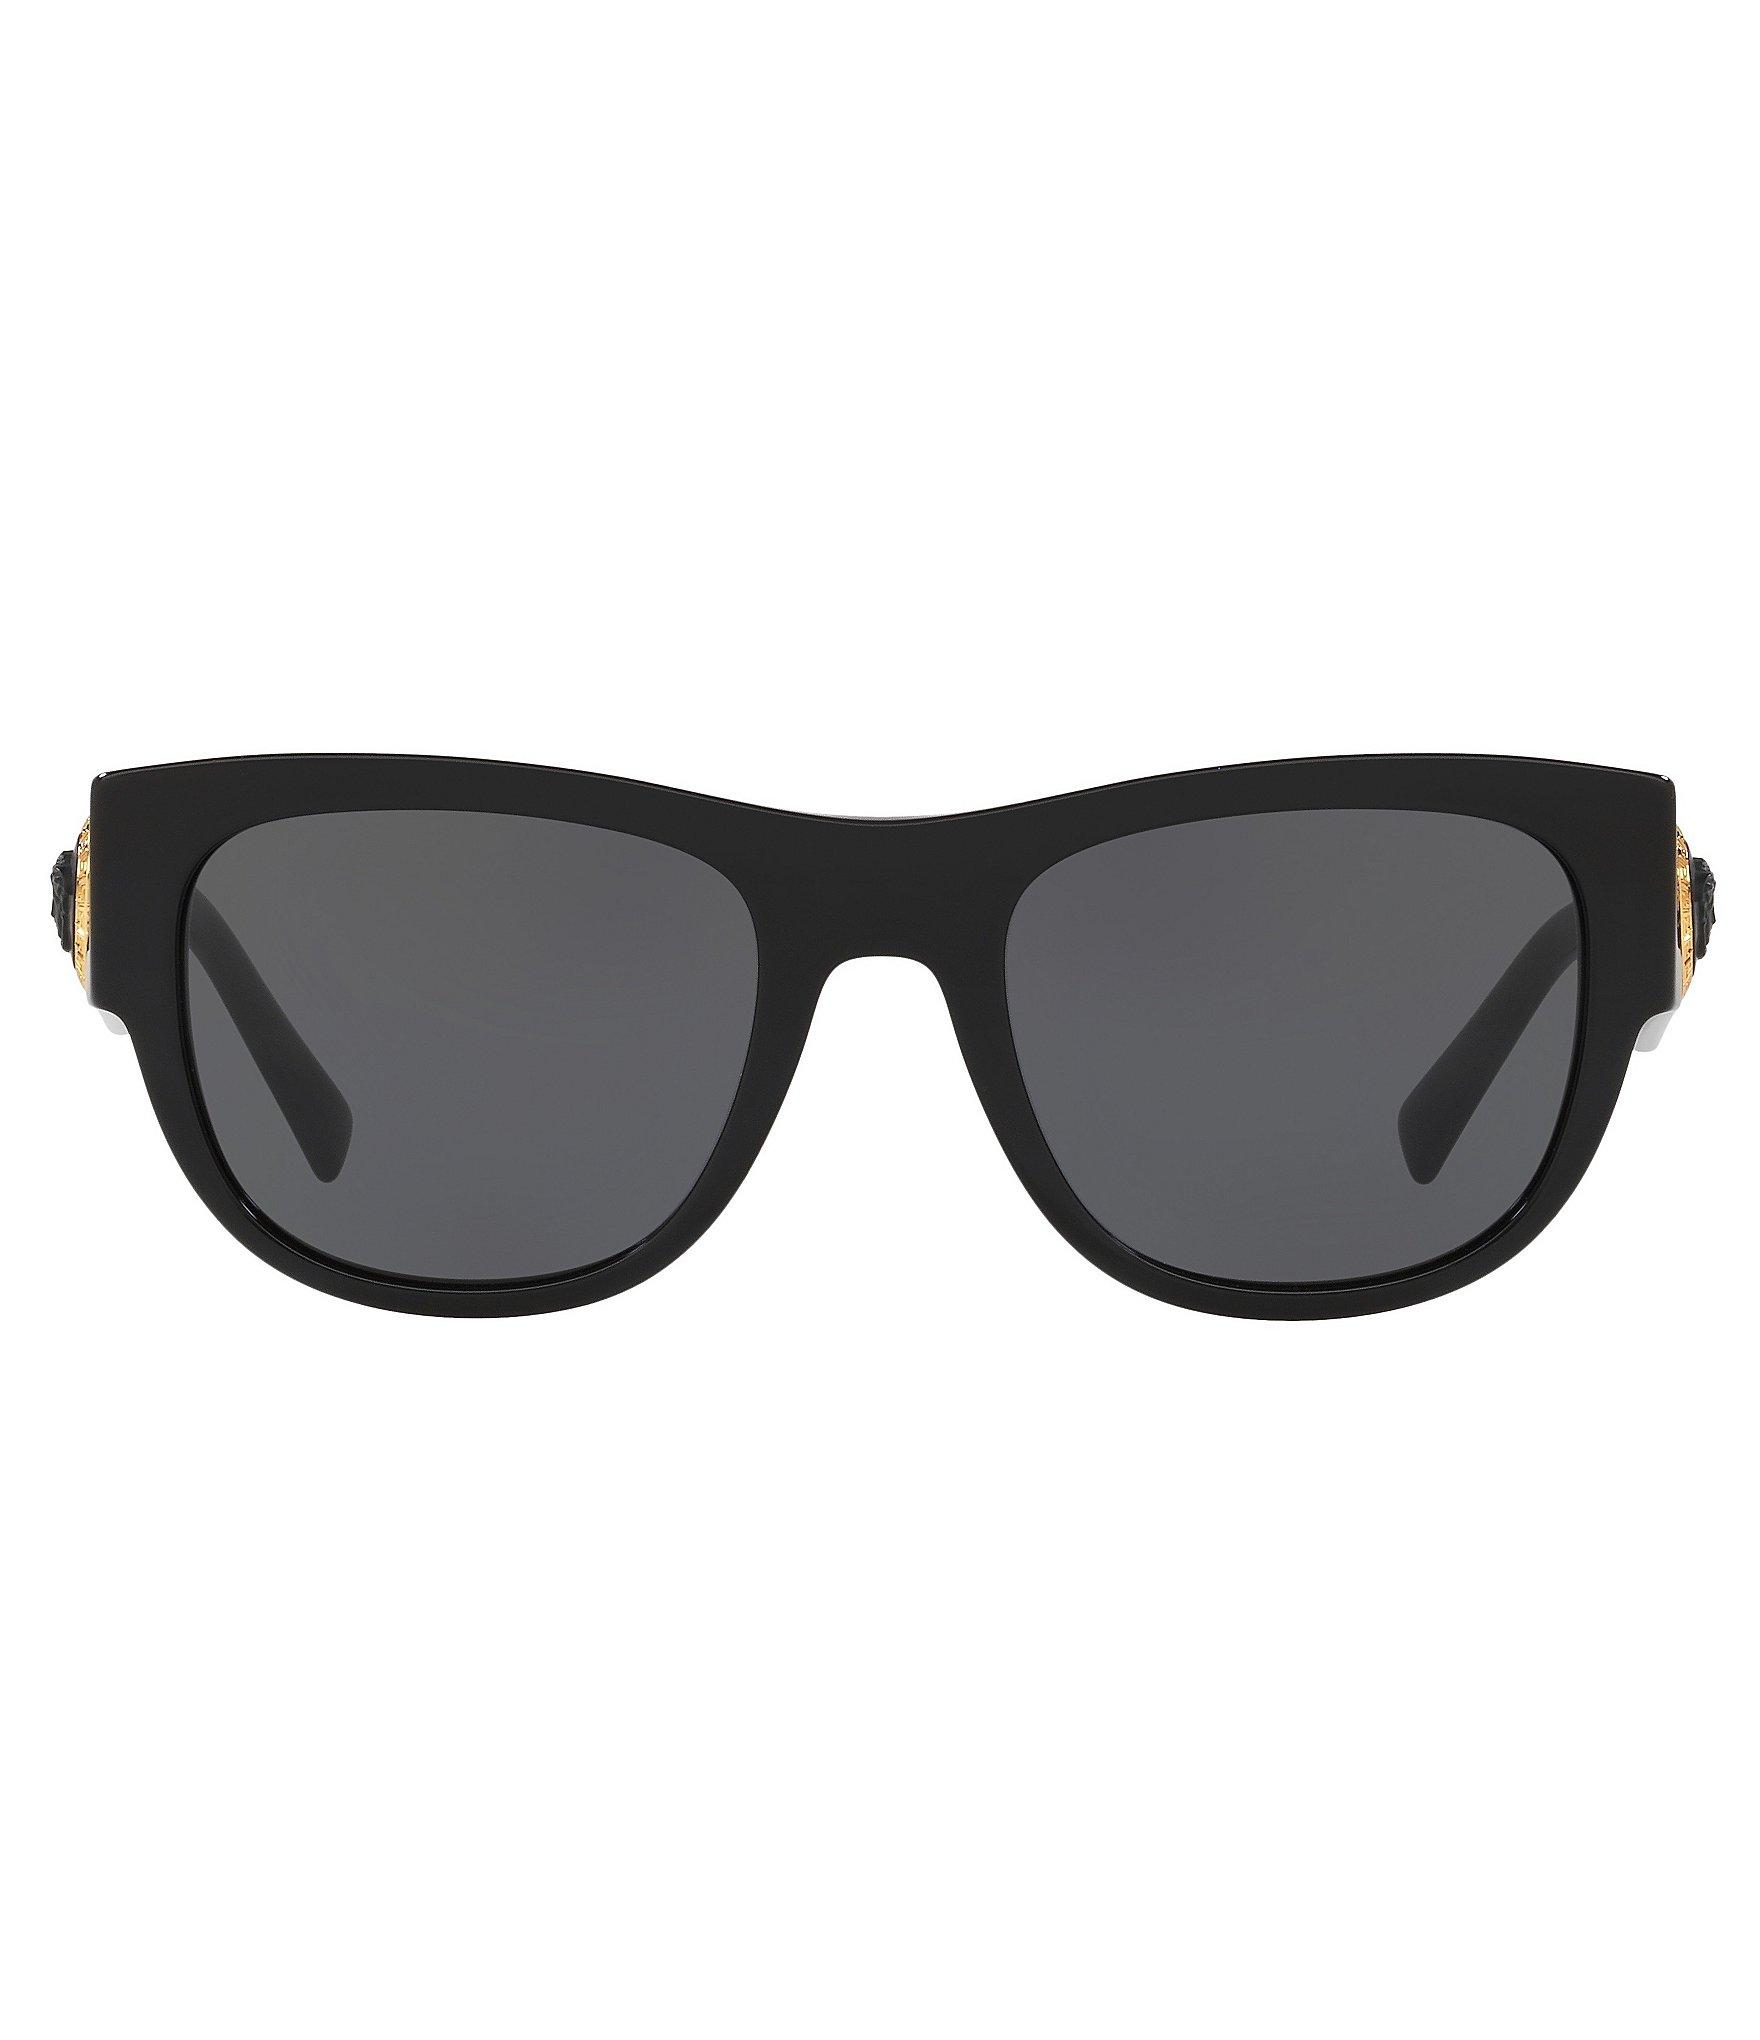 9bea06962d9f Versace - Black Sunglasses for Men - Lyst. View fullscreen